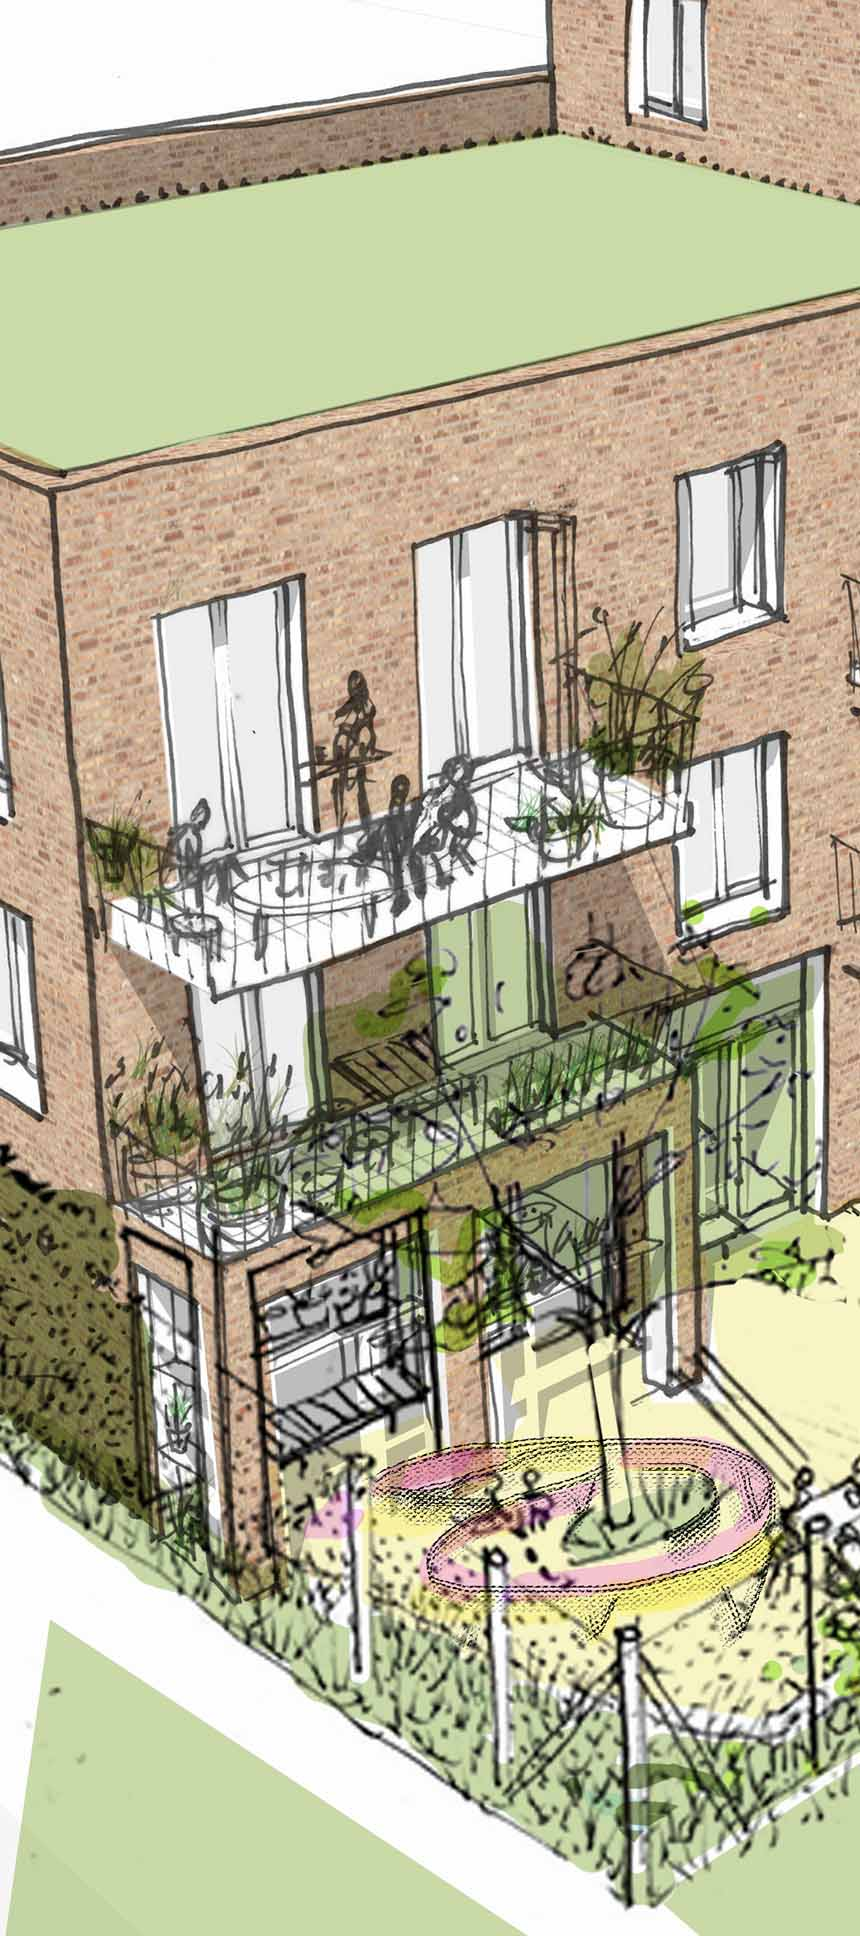 Pedro Street Ash Sakula sketch detail of the garden elevation